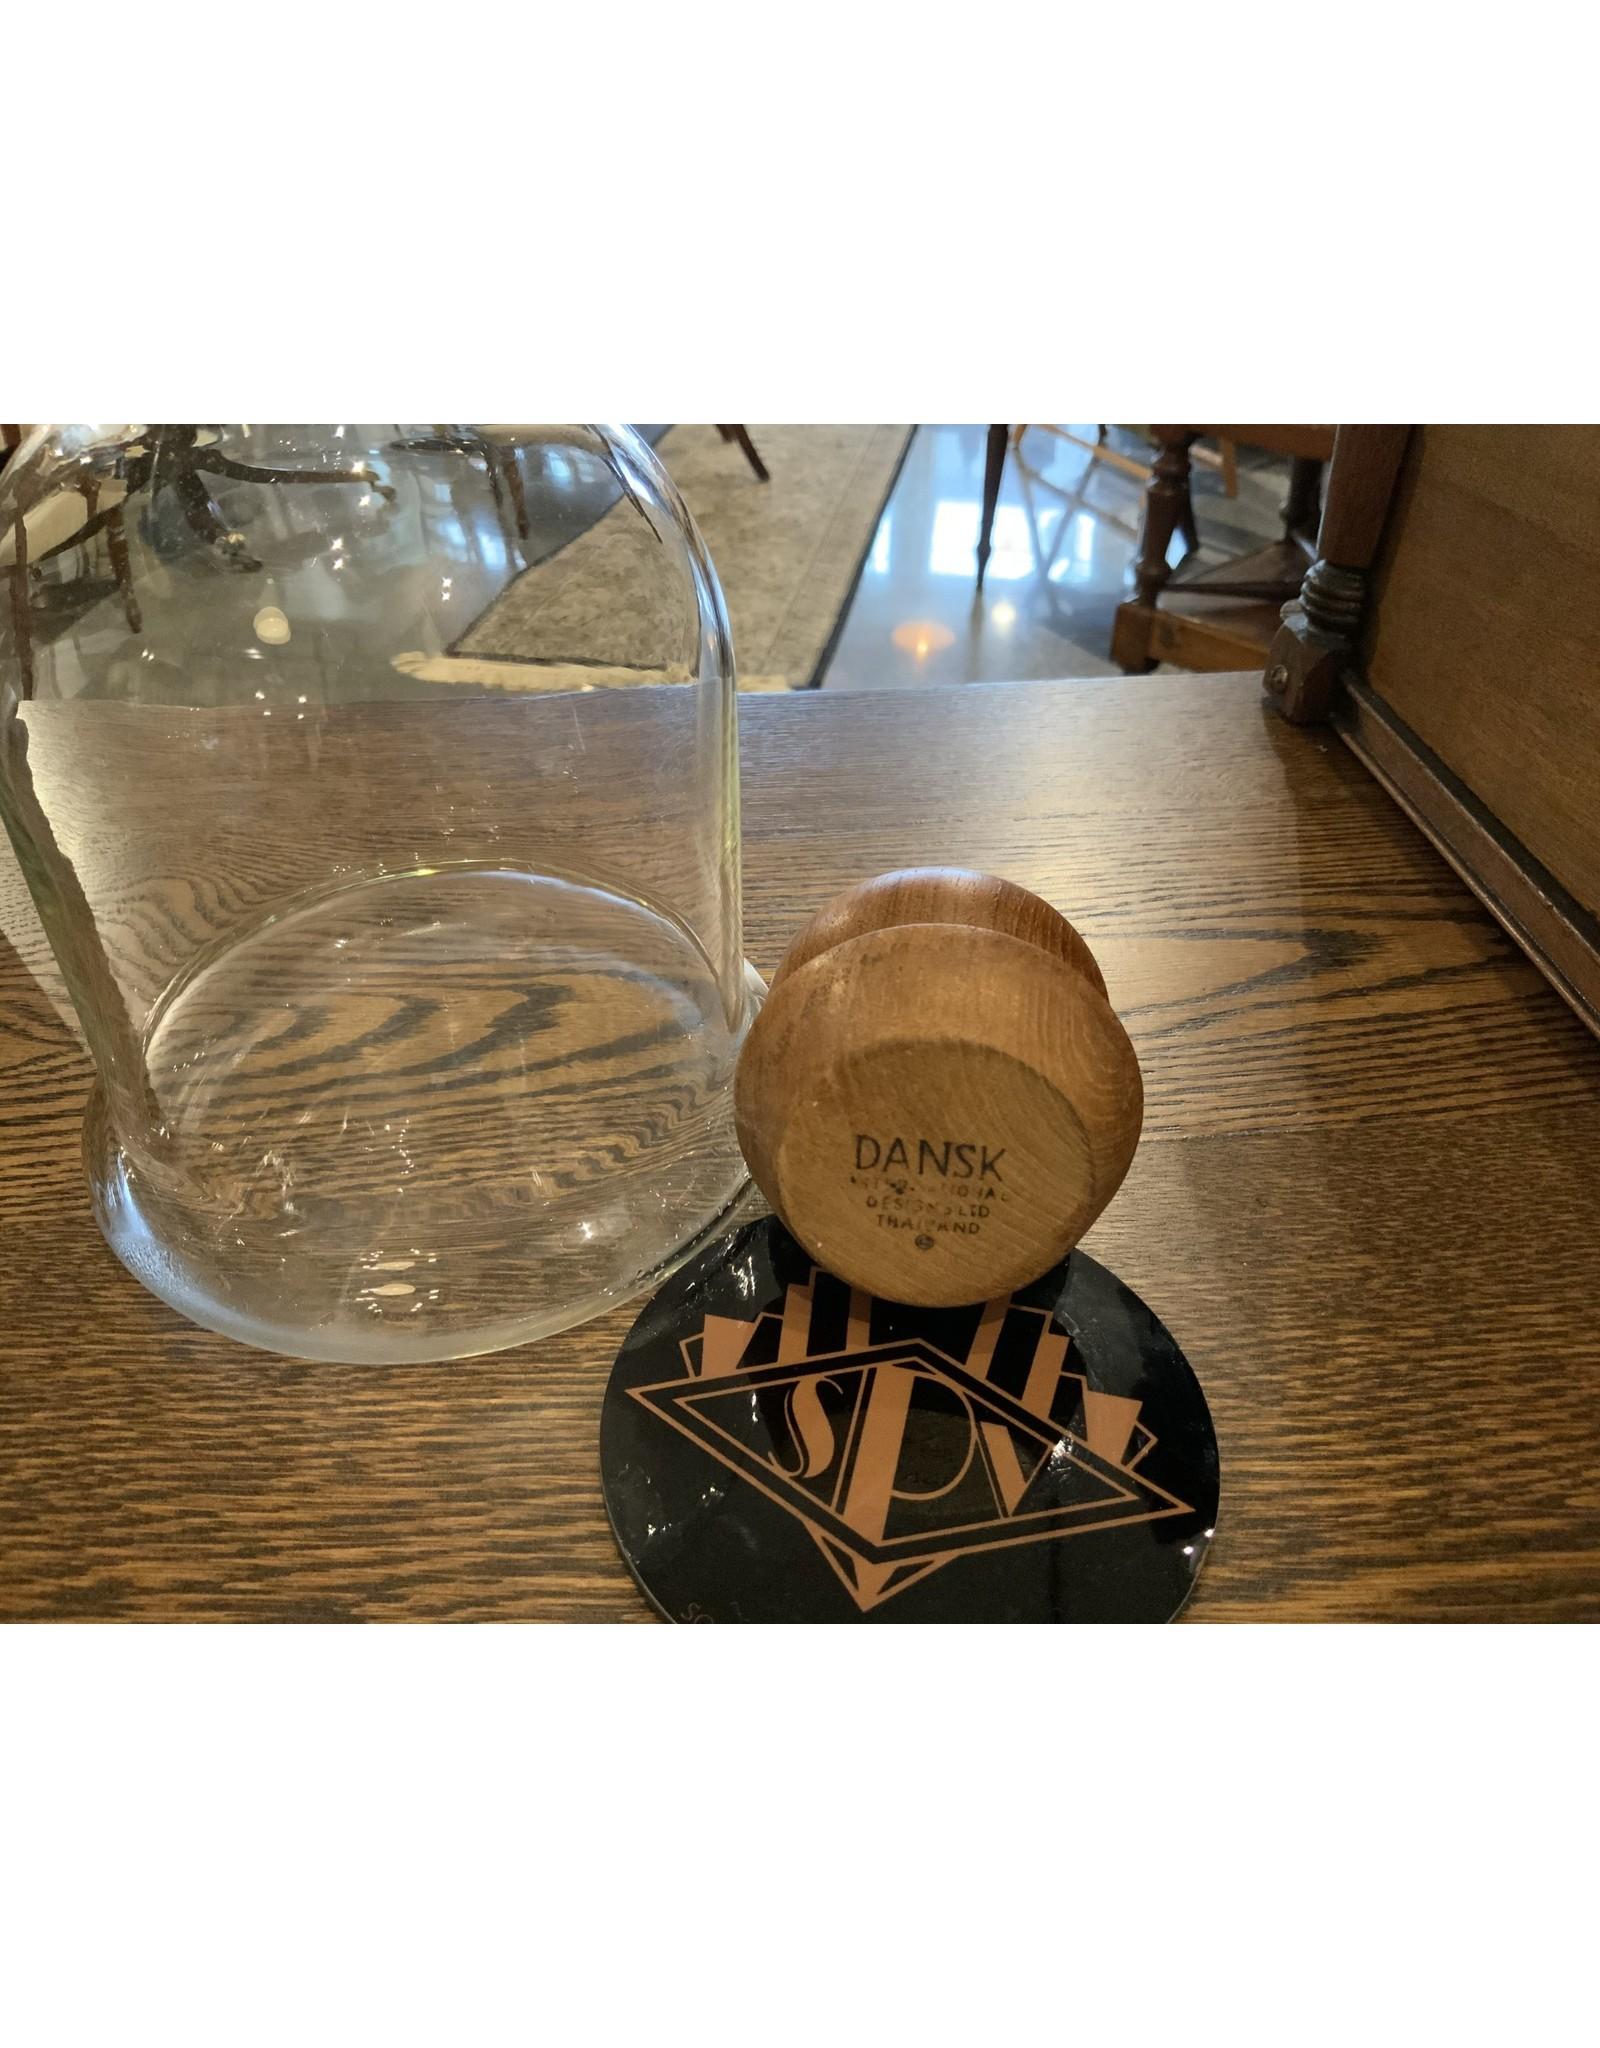 SPV Dansk Wine Carafe, 1-1/2 liters with teakwood stopper designed by Gunnar Cyren